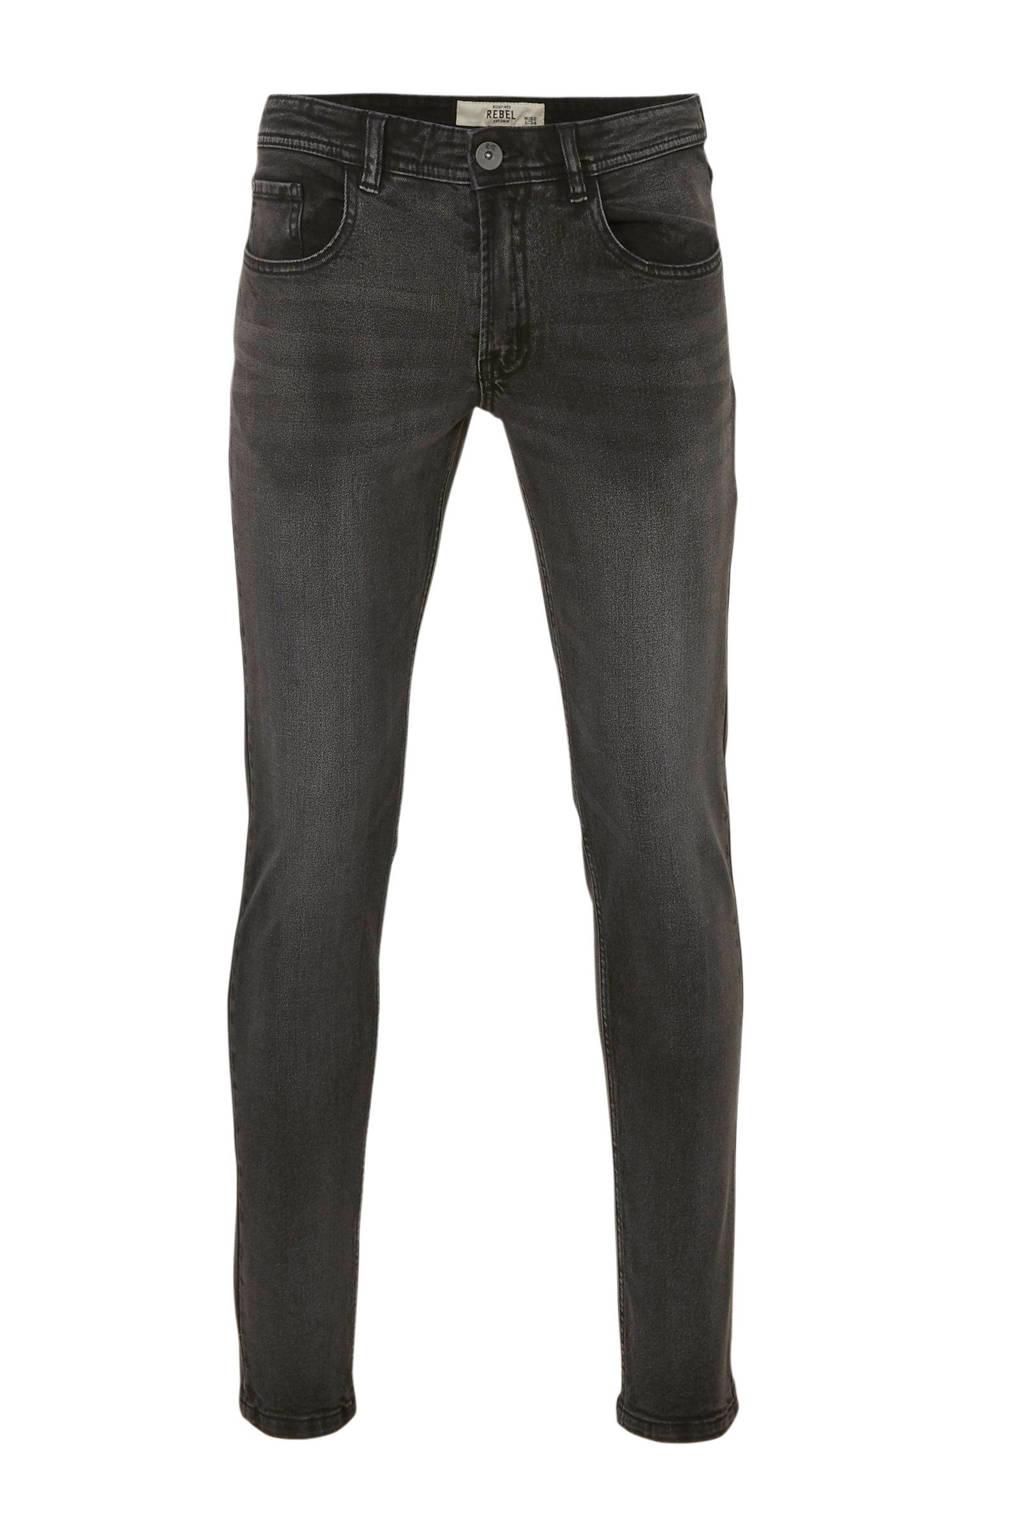 Redefined Rebel skinny jeans RR Copenhagen black rock, Black Rock